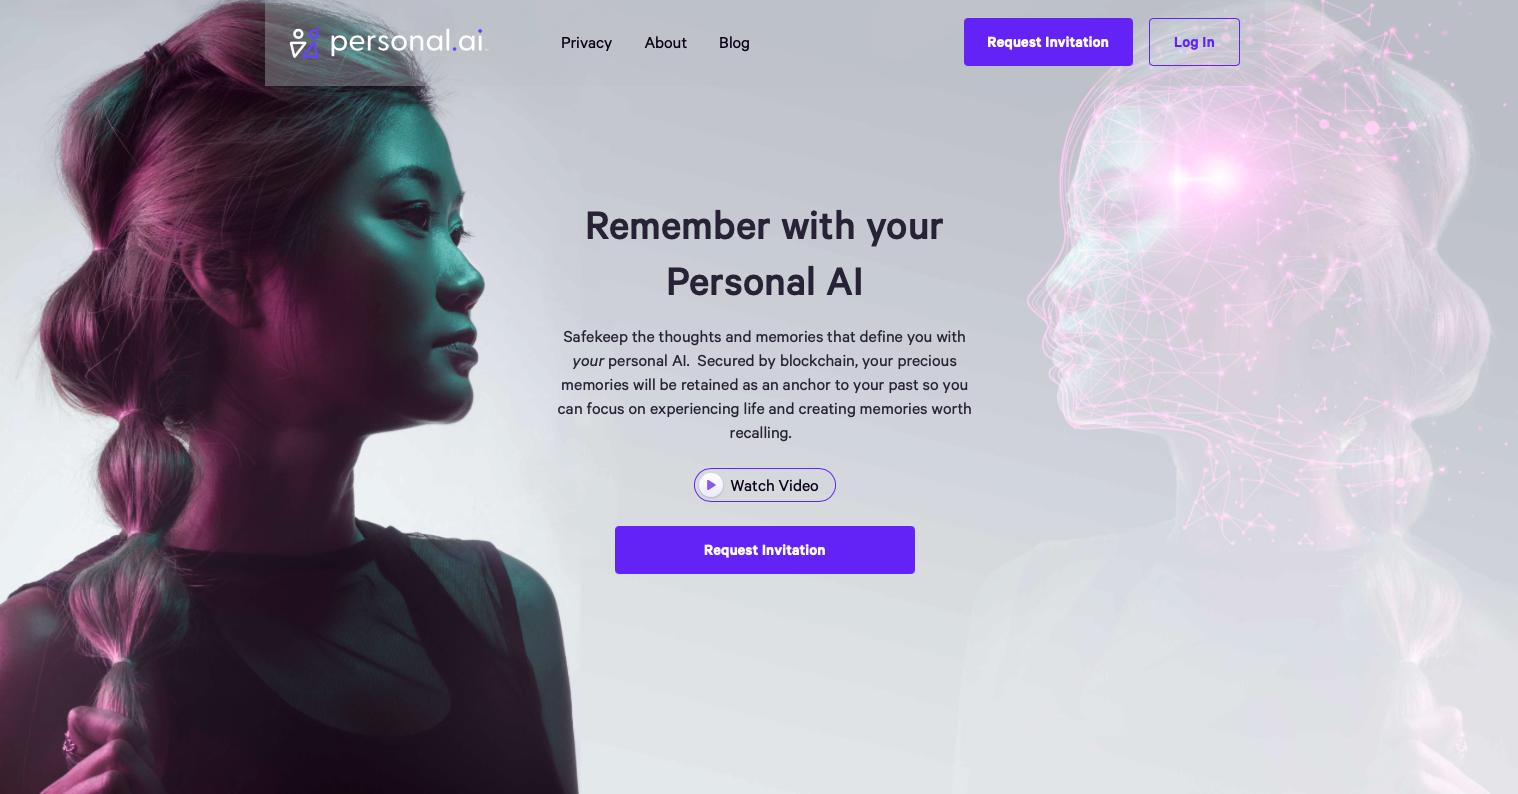 Personal AI